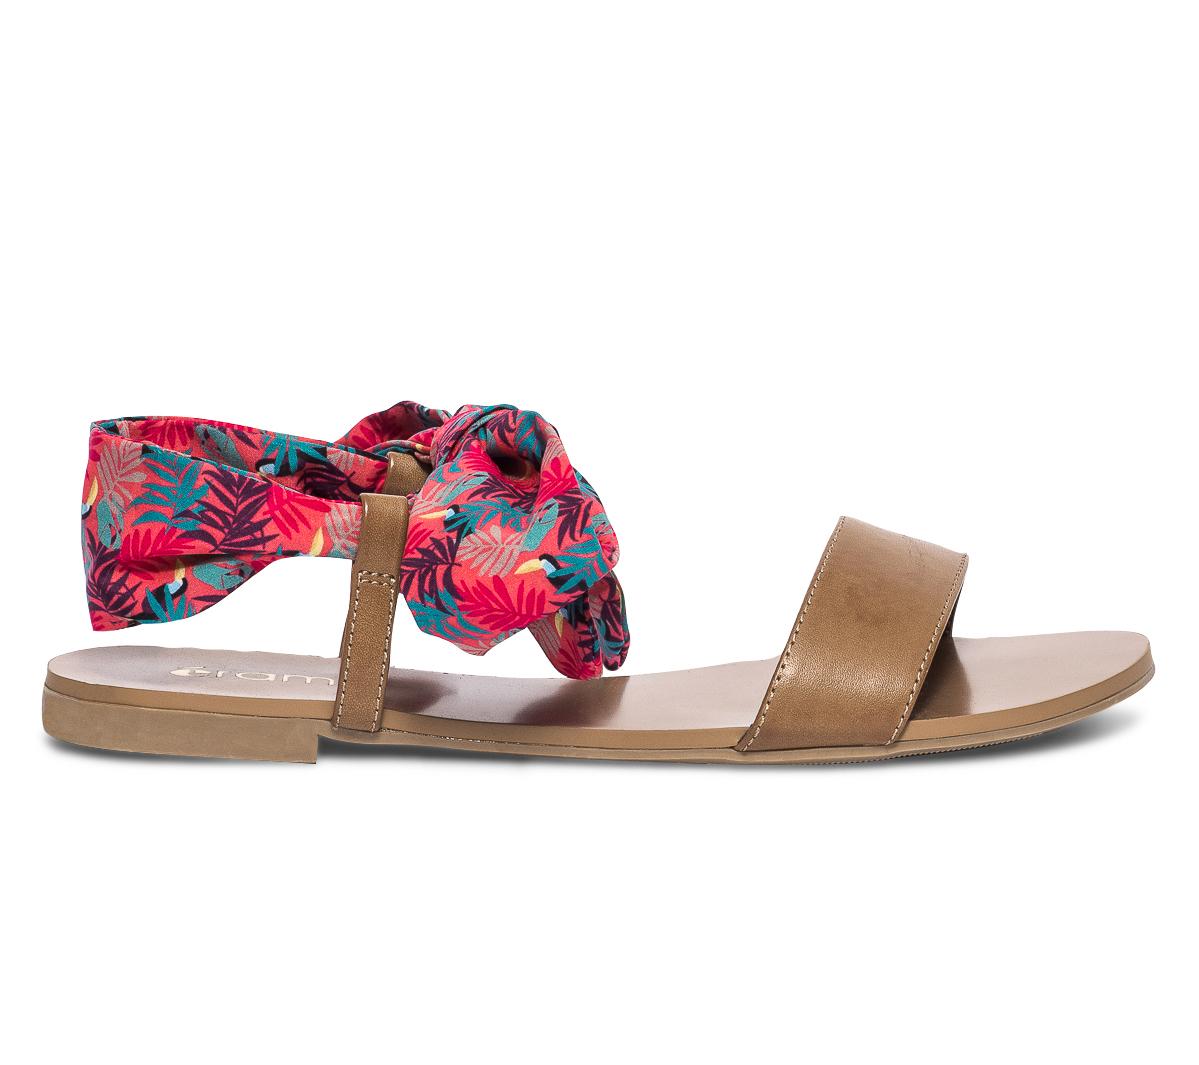 Sandale Avec Eram Camel Ruban Imprimé Feuilles kXZPiOuTw